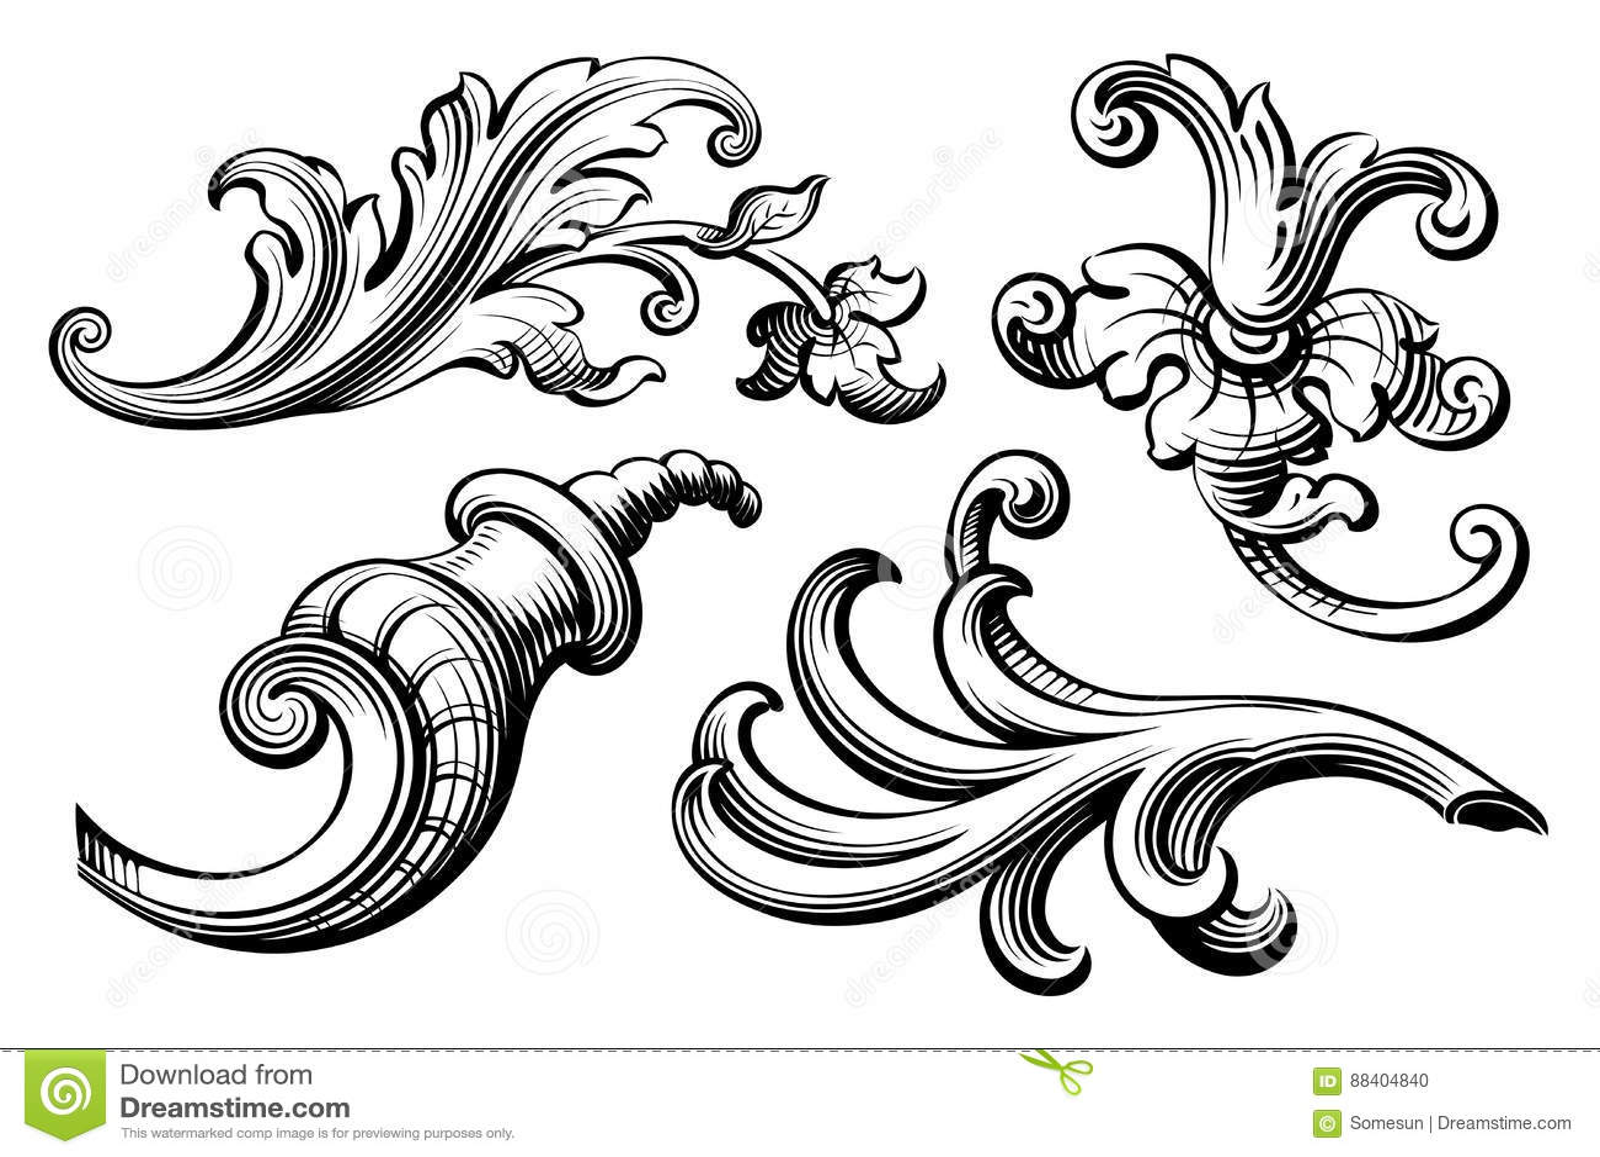 vintage baroque victorian frame border monogram floral ornament scroll engraved retro pattern